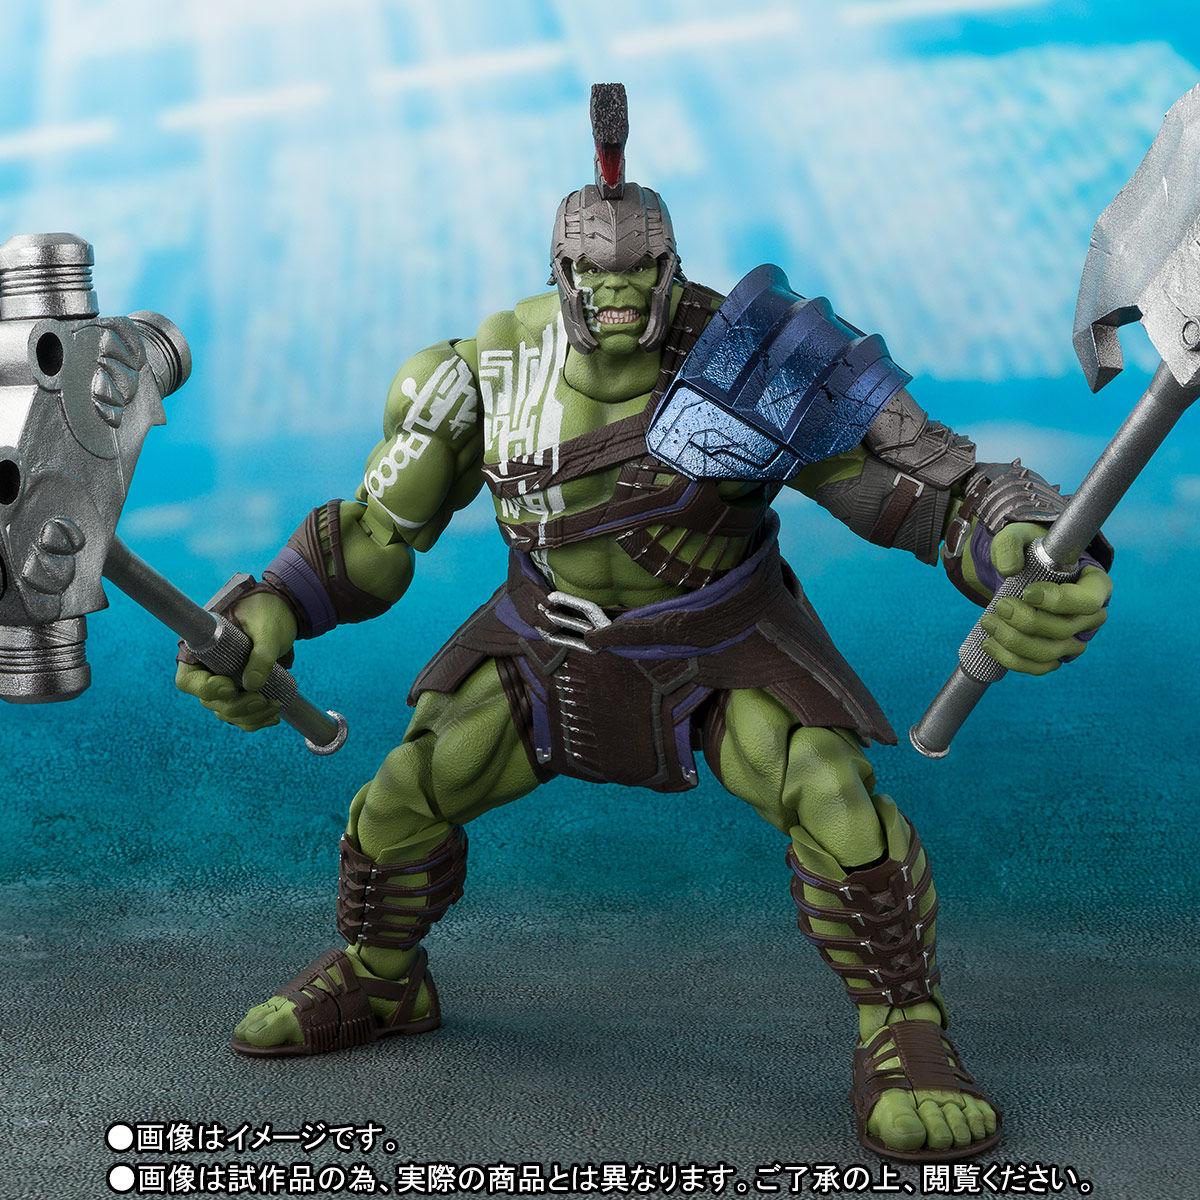 Bandai Tamashii Nations S.H.Figuarts Thor: Ragnarok – Thor & Gladiator Hulk Figures Update